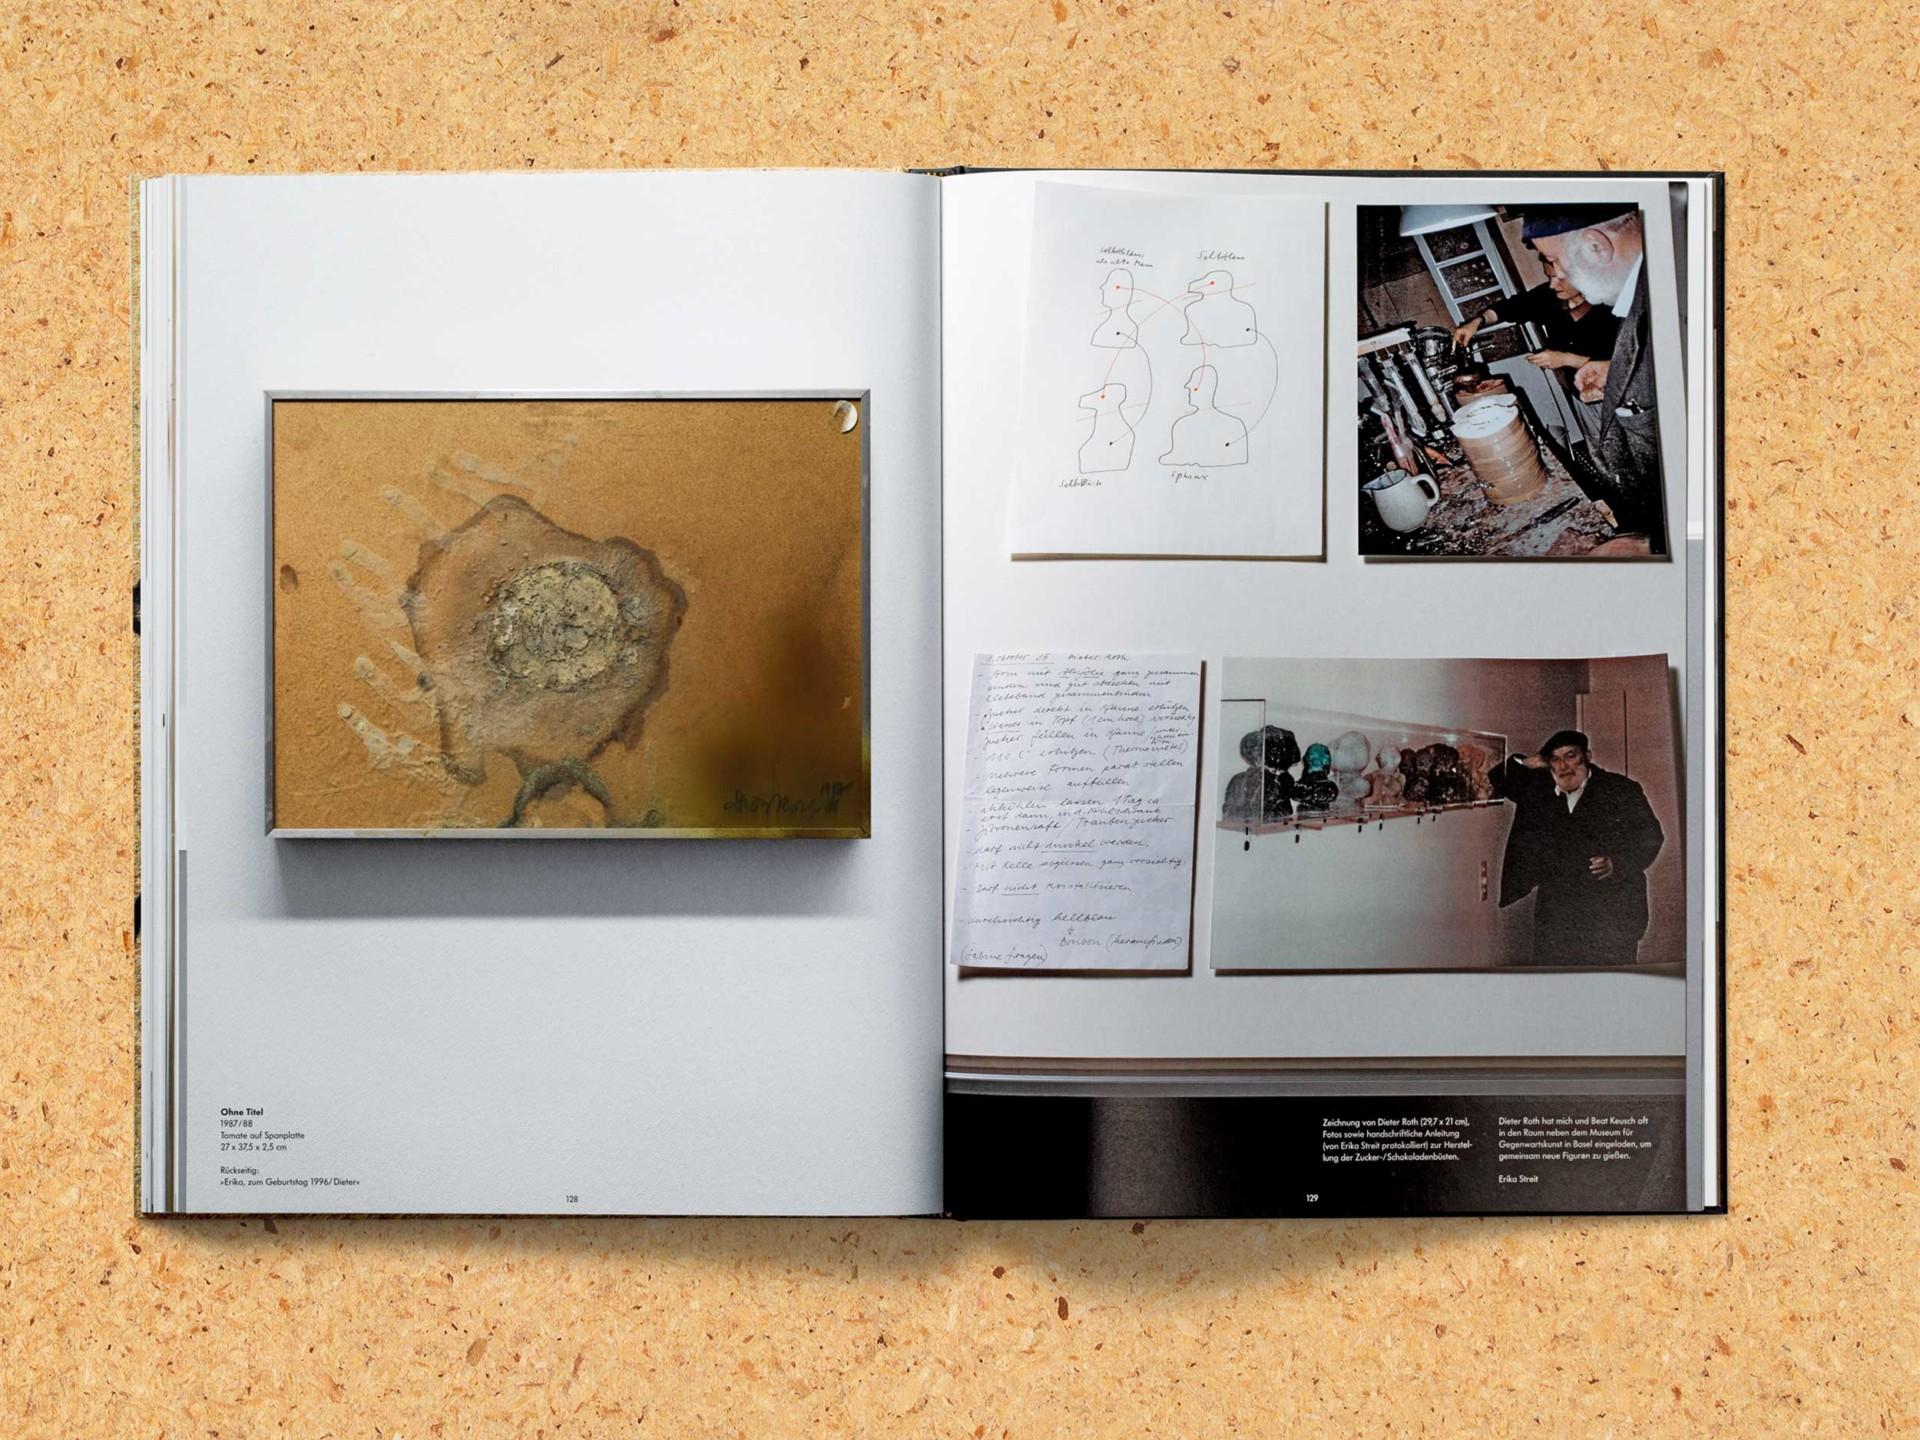 BKVK Dieter Roth Souvenirs — Buchgestaltung